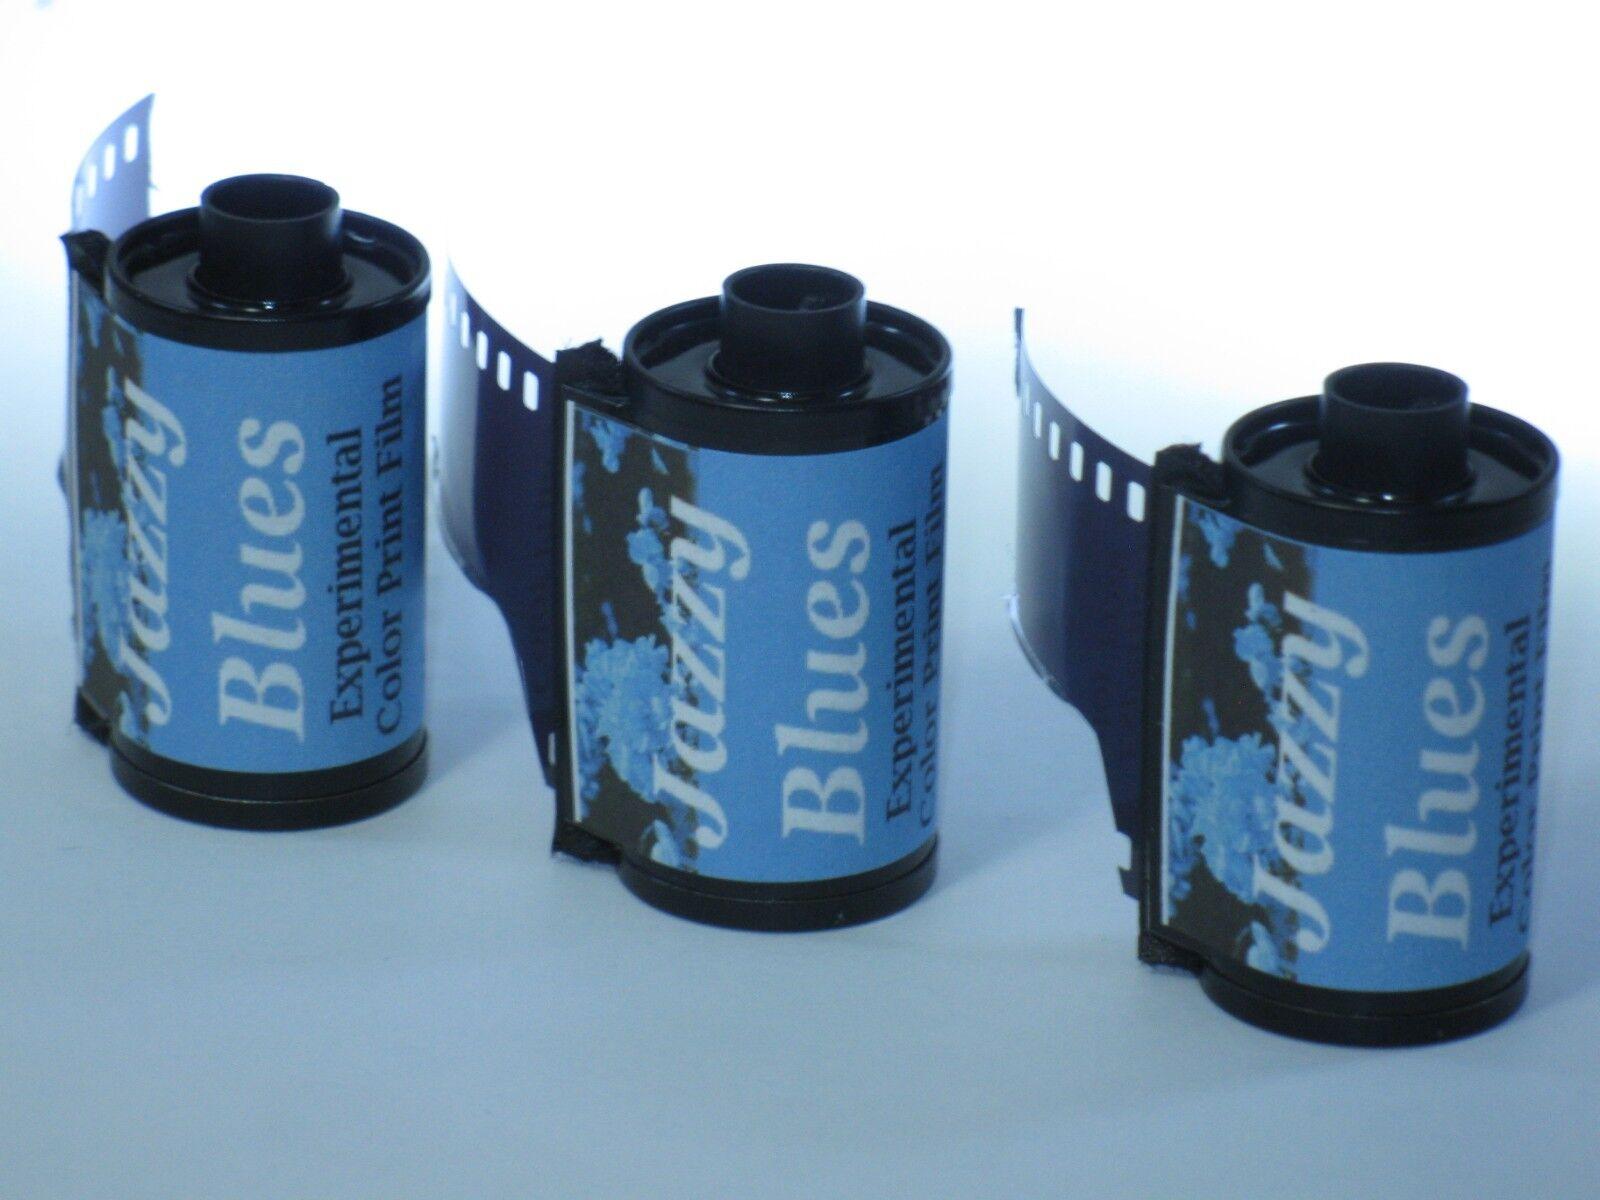 3 Rolls Ultrafine Jazzy Blues Experimental Color Print Film